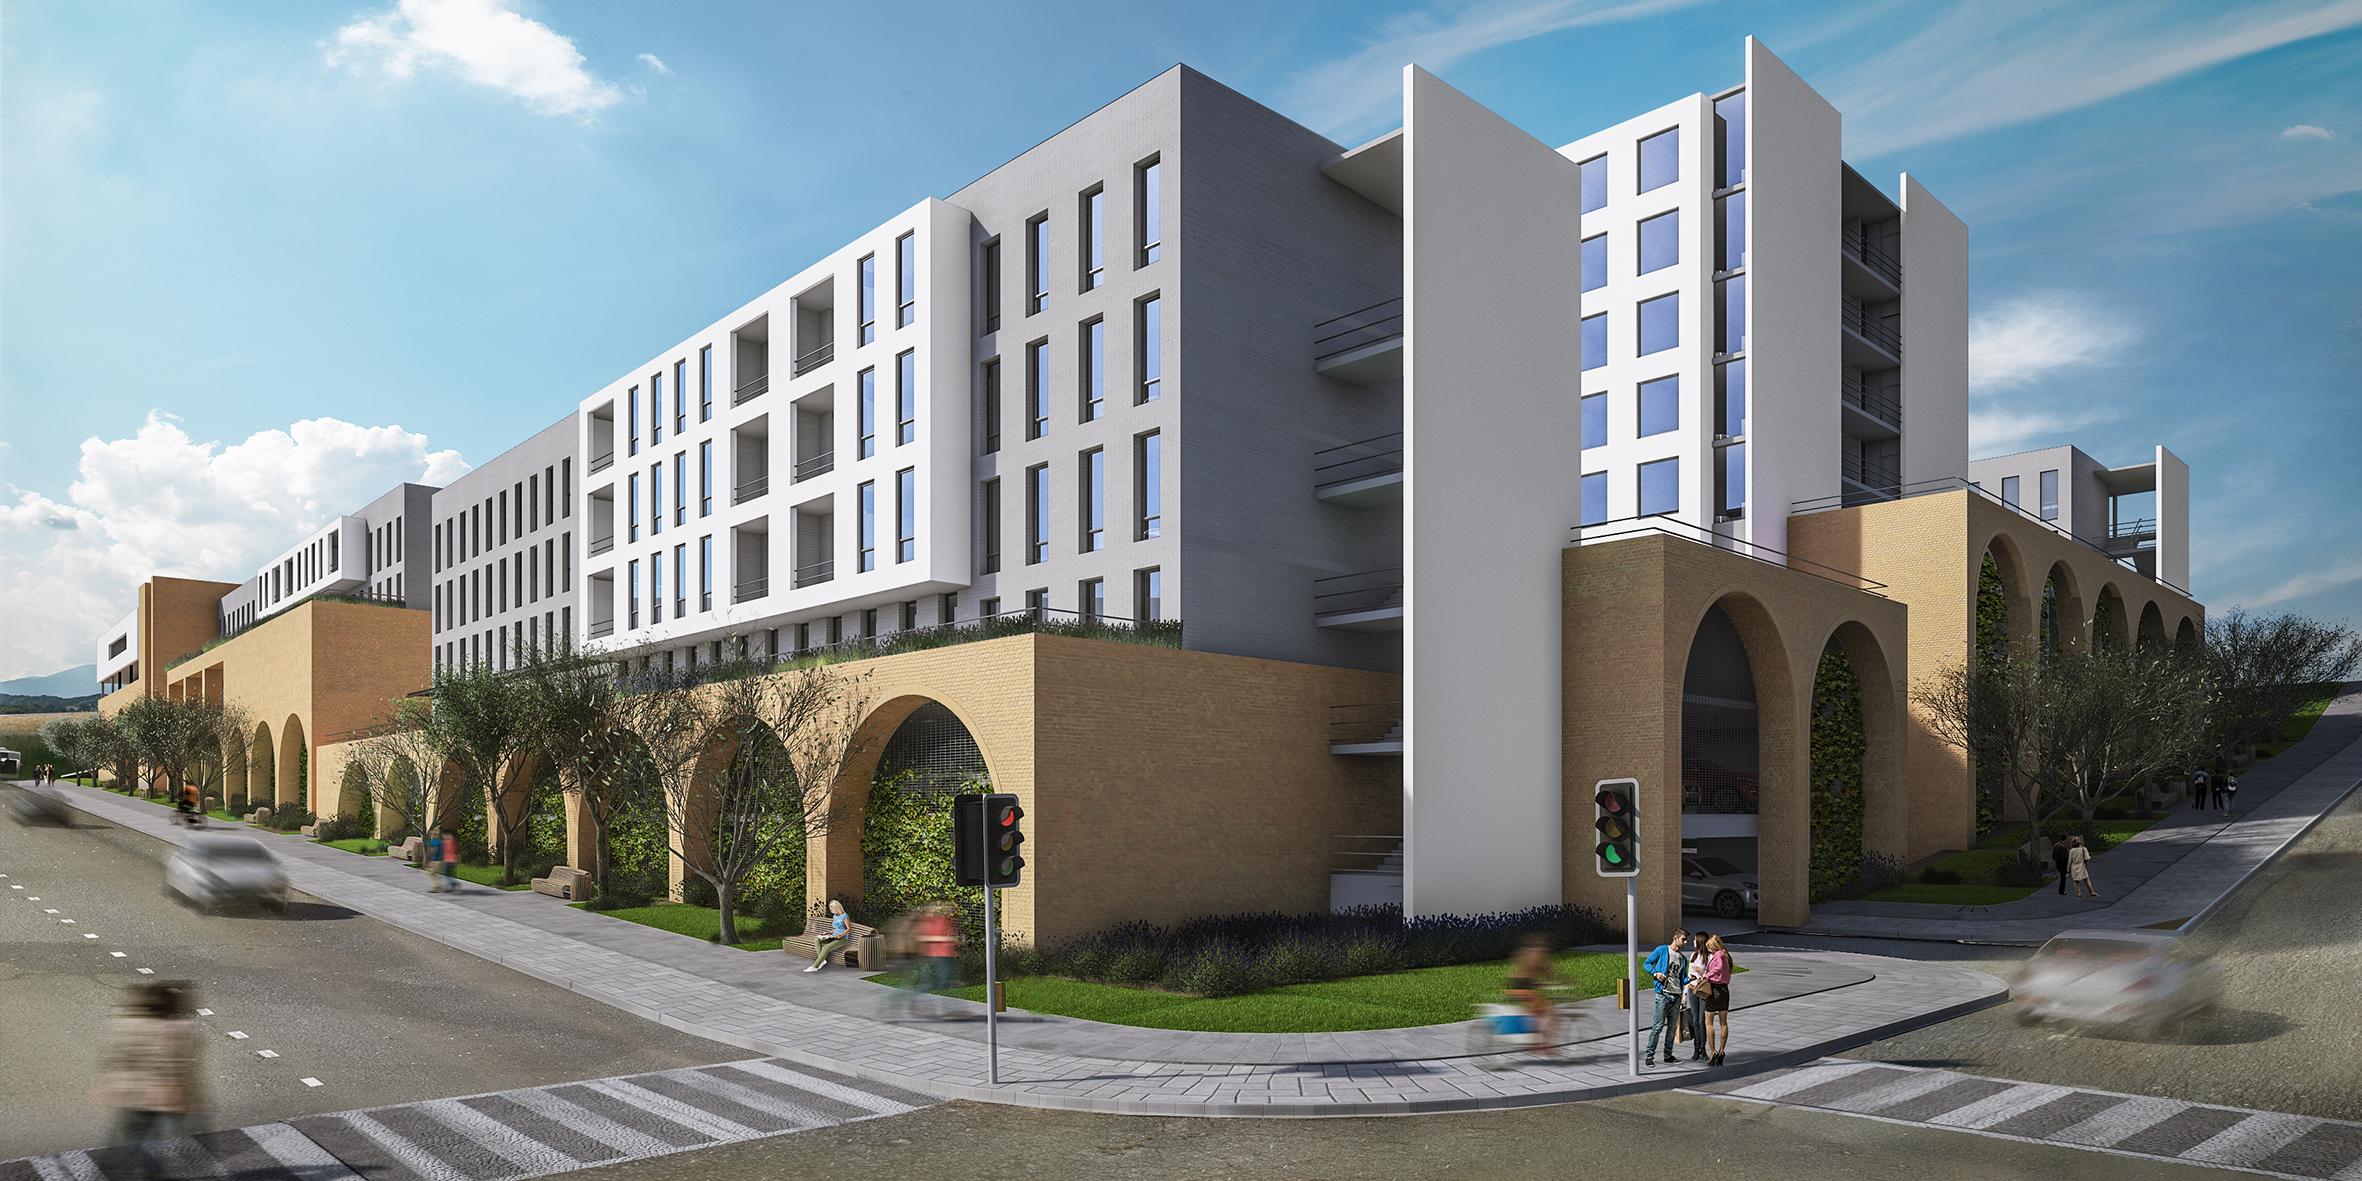 848 mixed use development, slideshow street